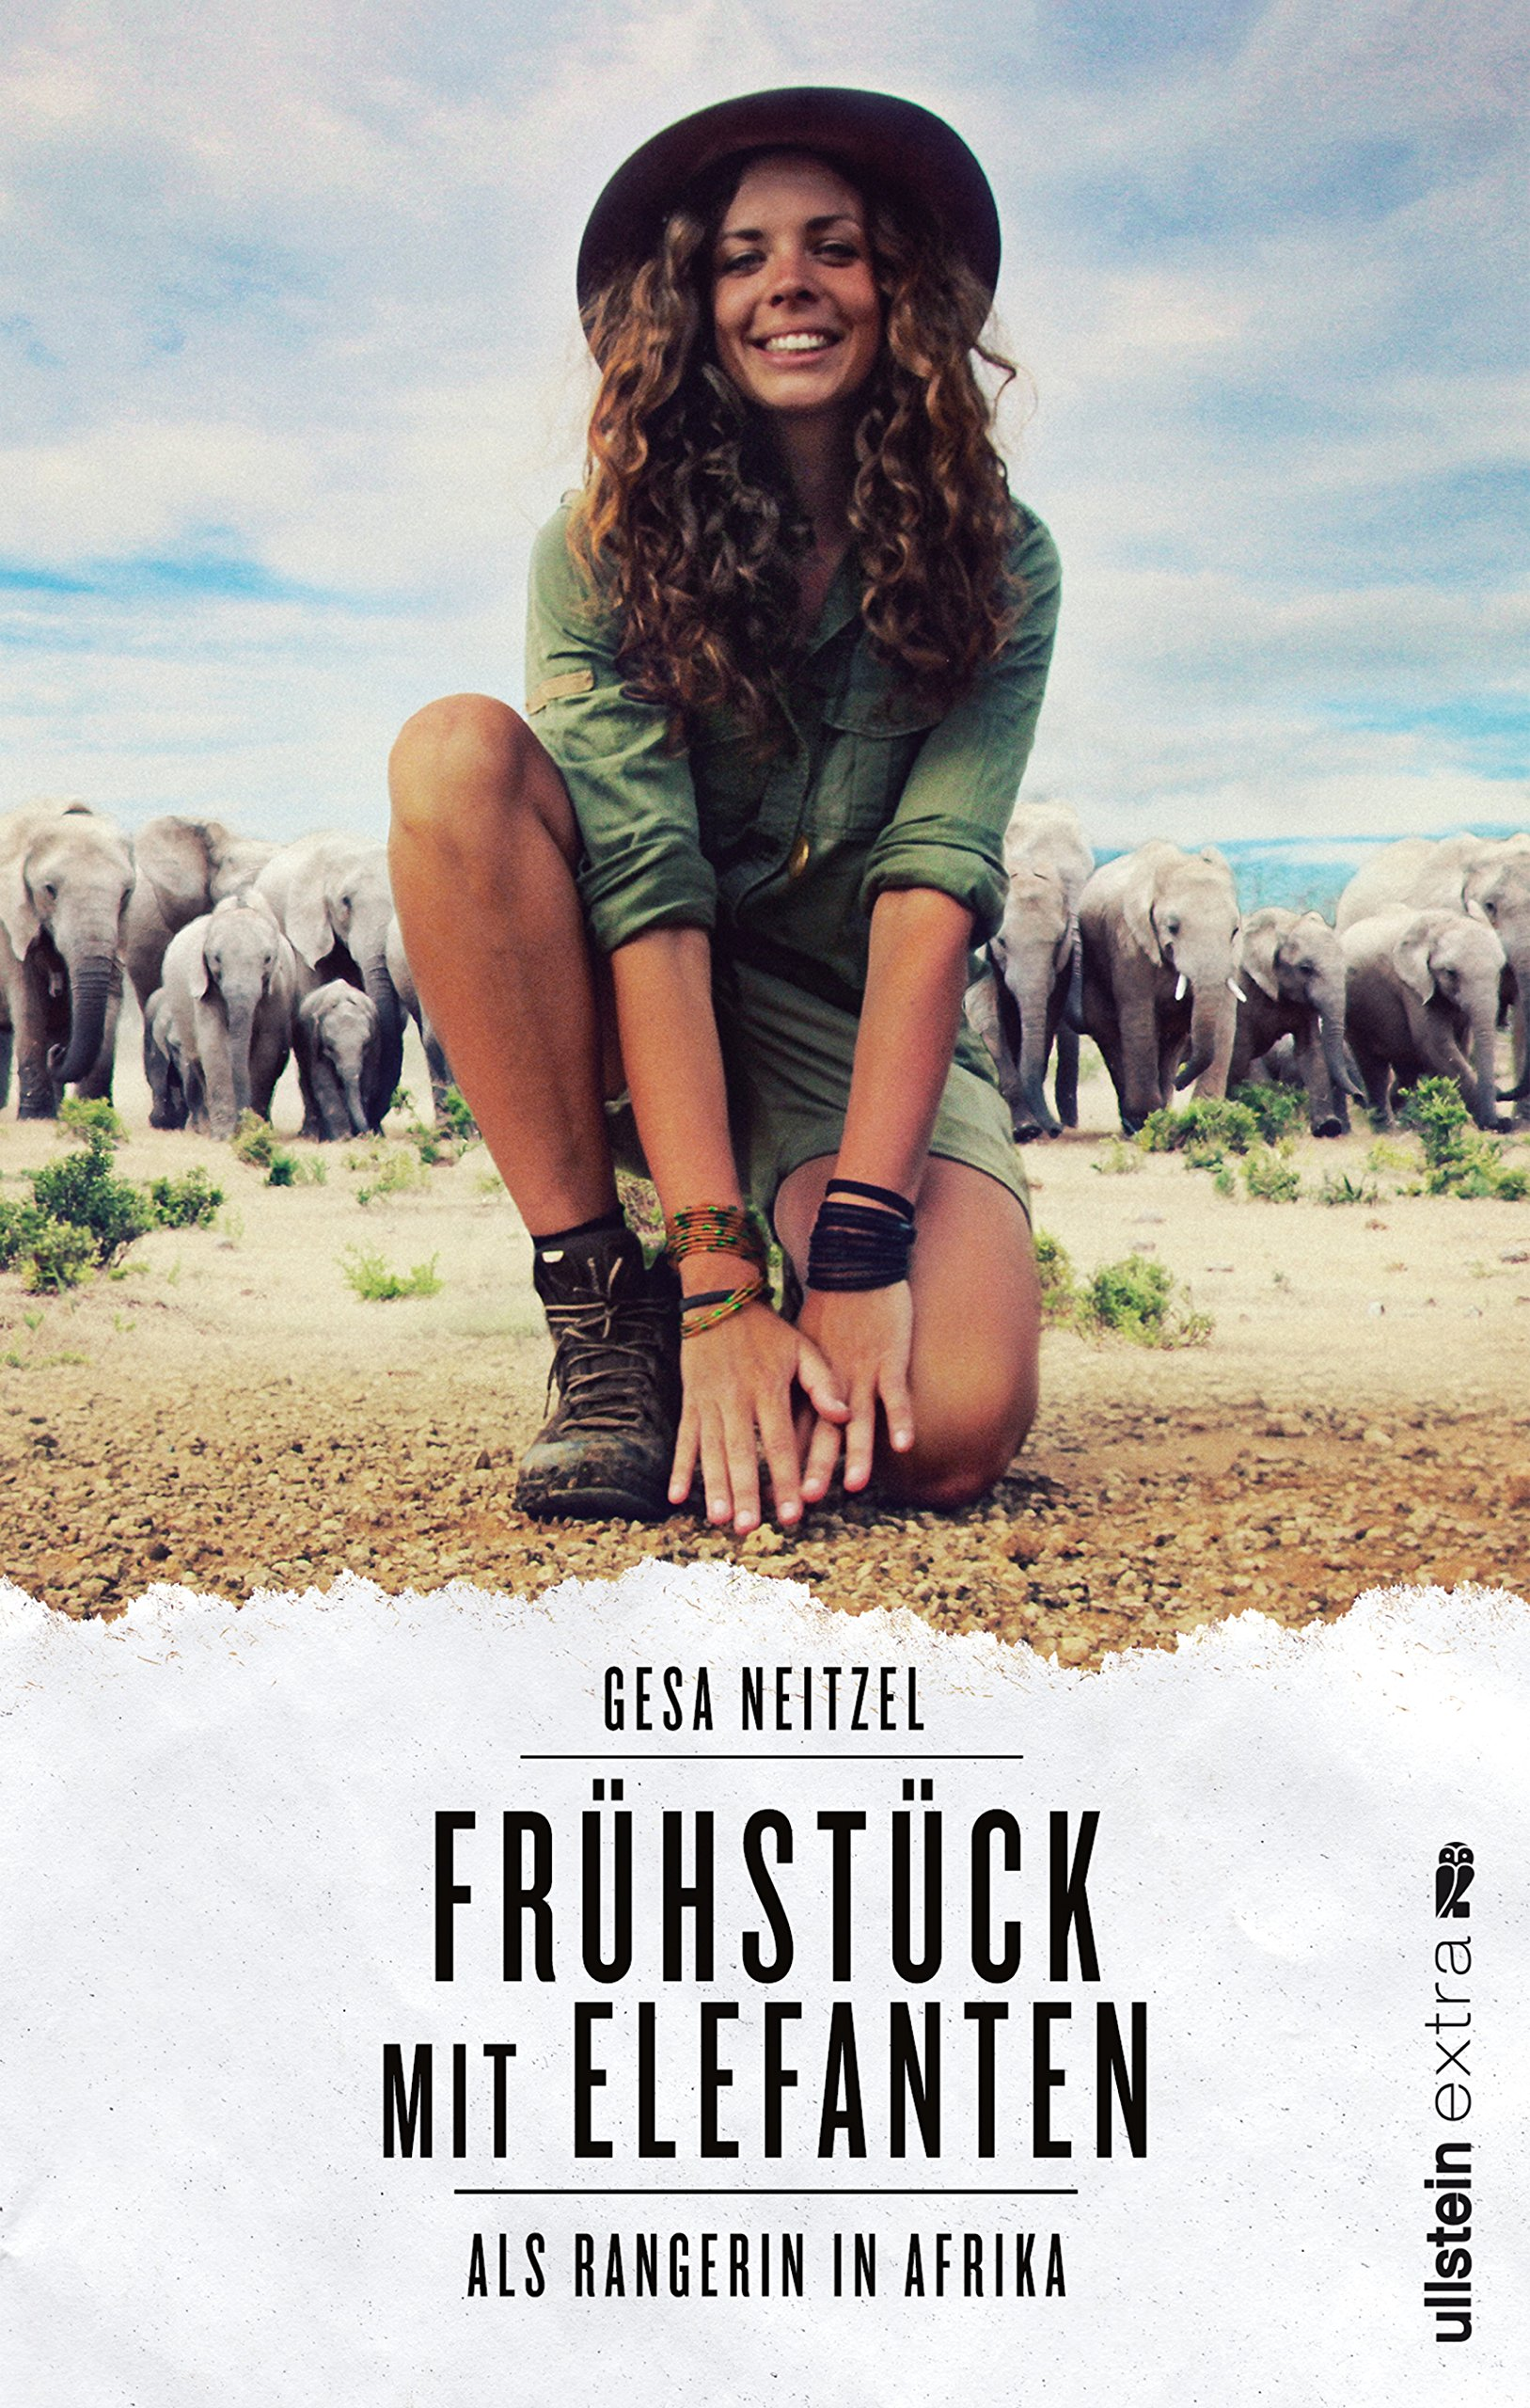 Frühstück mit Elefanten: Als Rangerin in Afrika Broschiert – 9. September 2016 Gesa Neitzel Ullstein extra 3864930308 Belletristik / Biographien